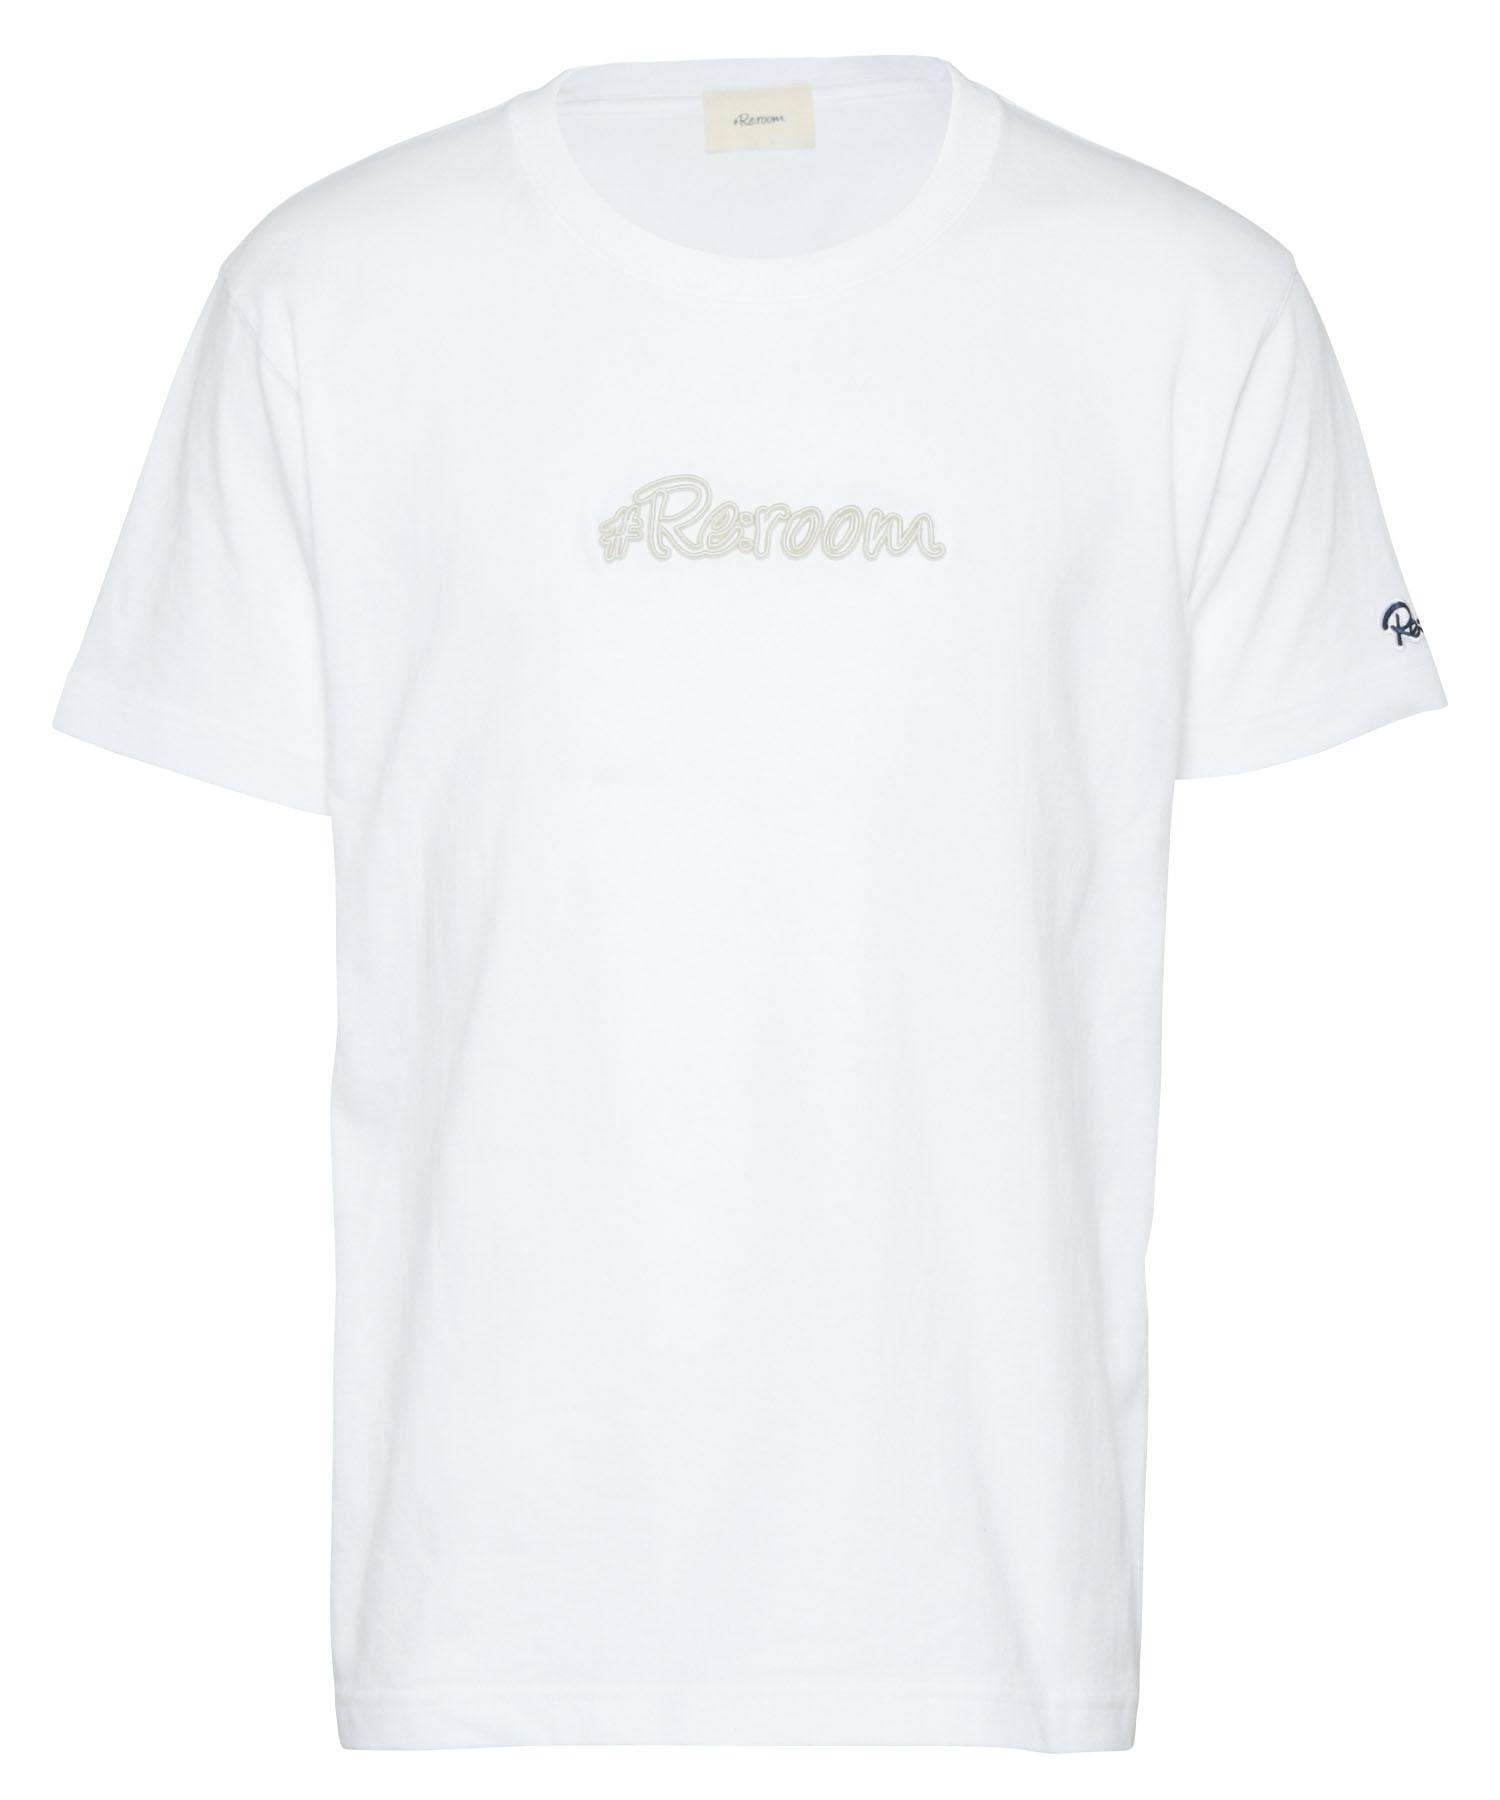 3D LOGO FRAME EMBROIDERY T-shirt[REC478]